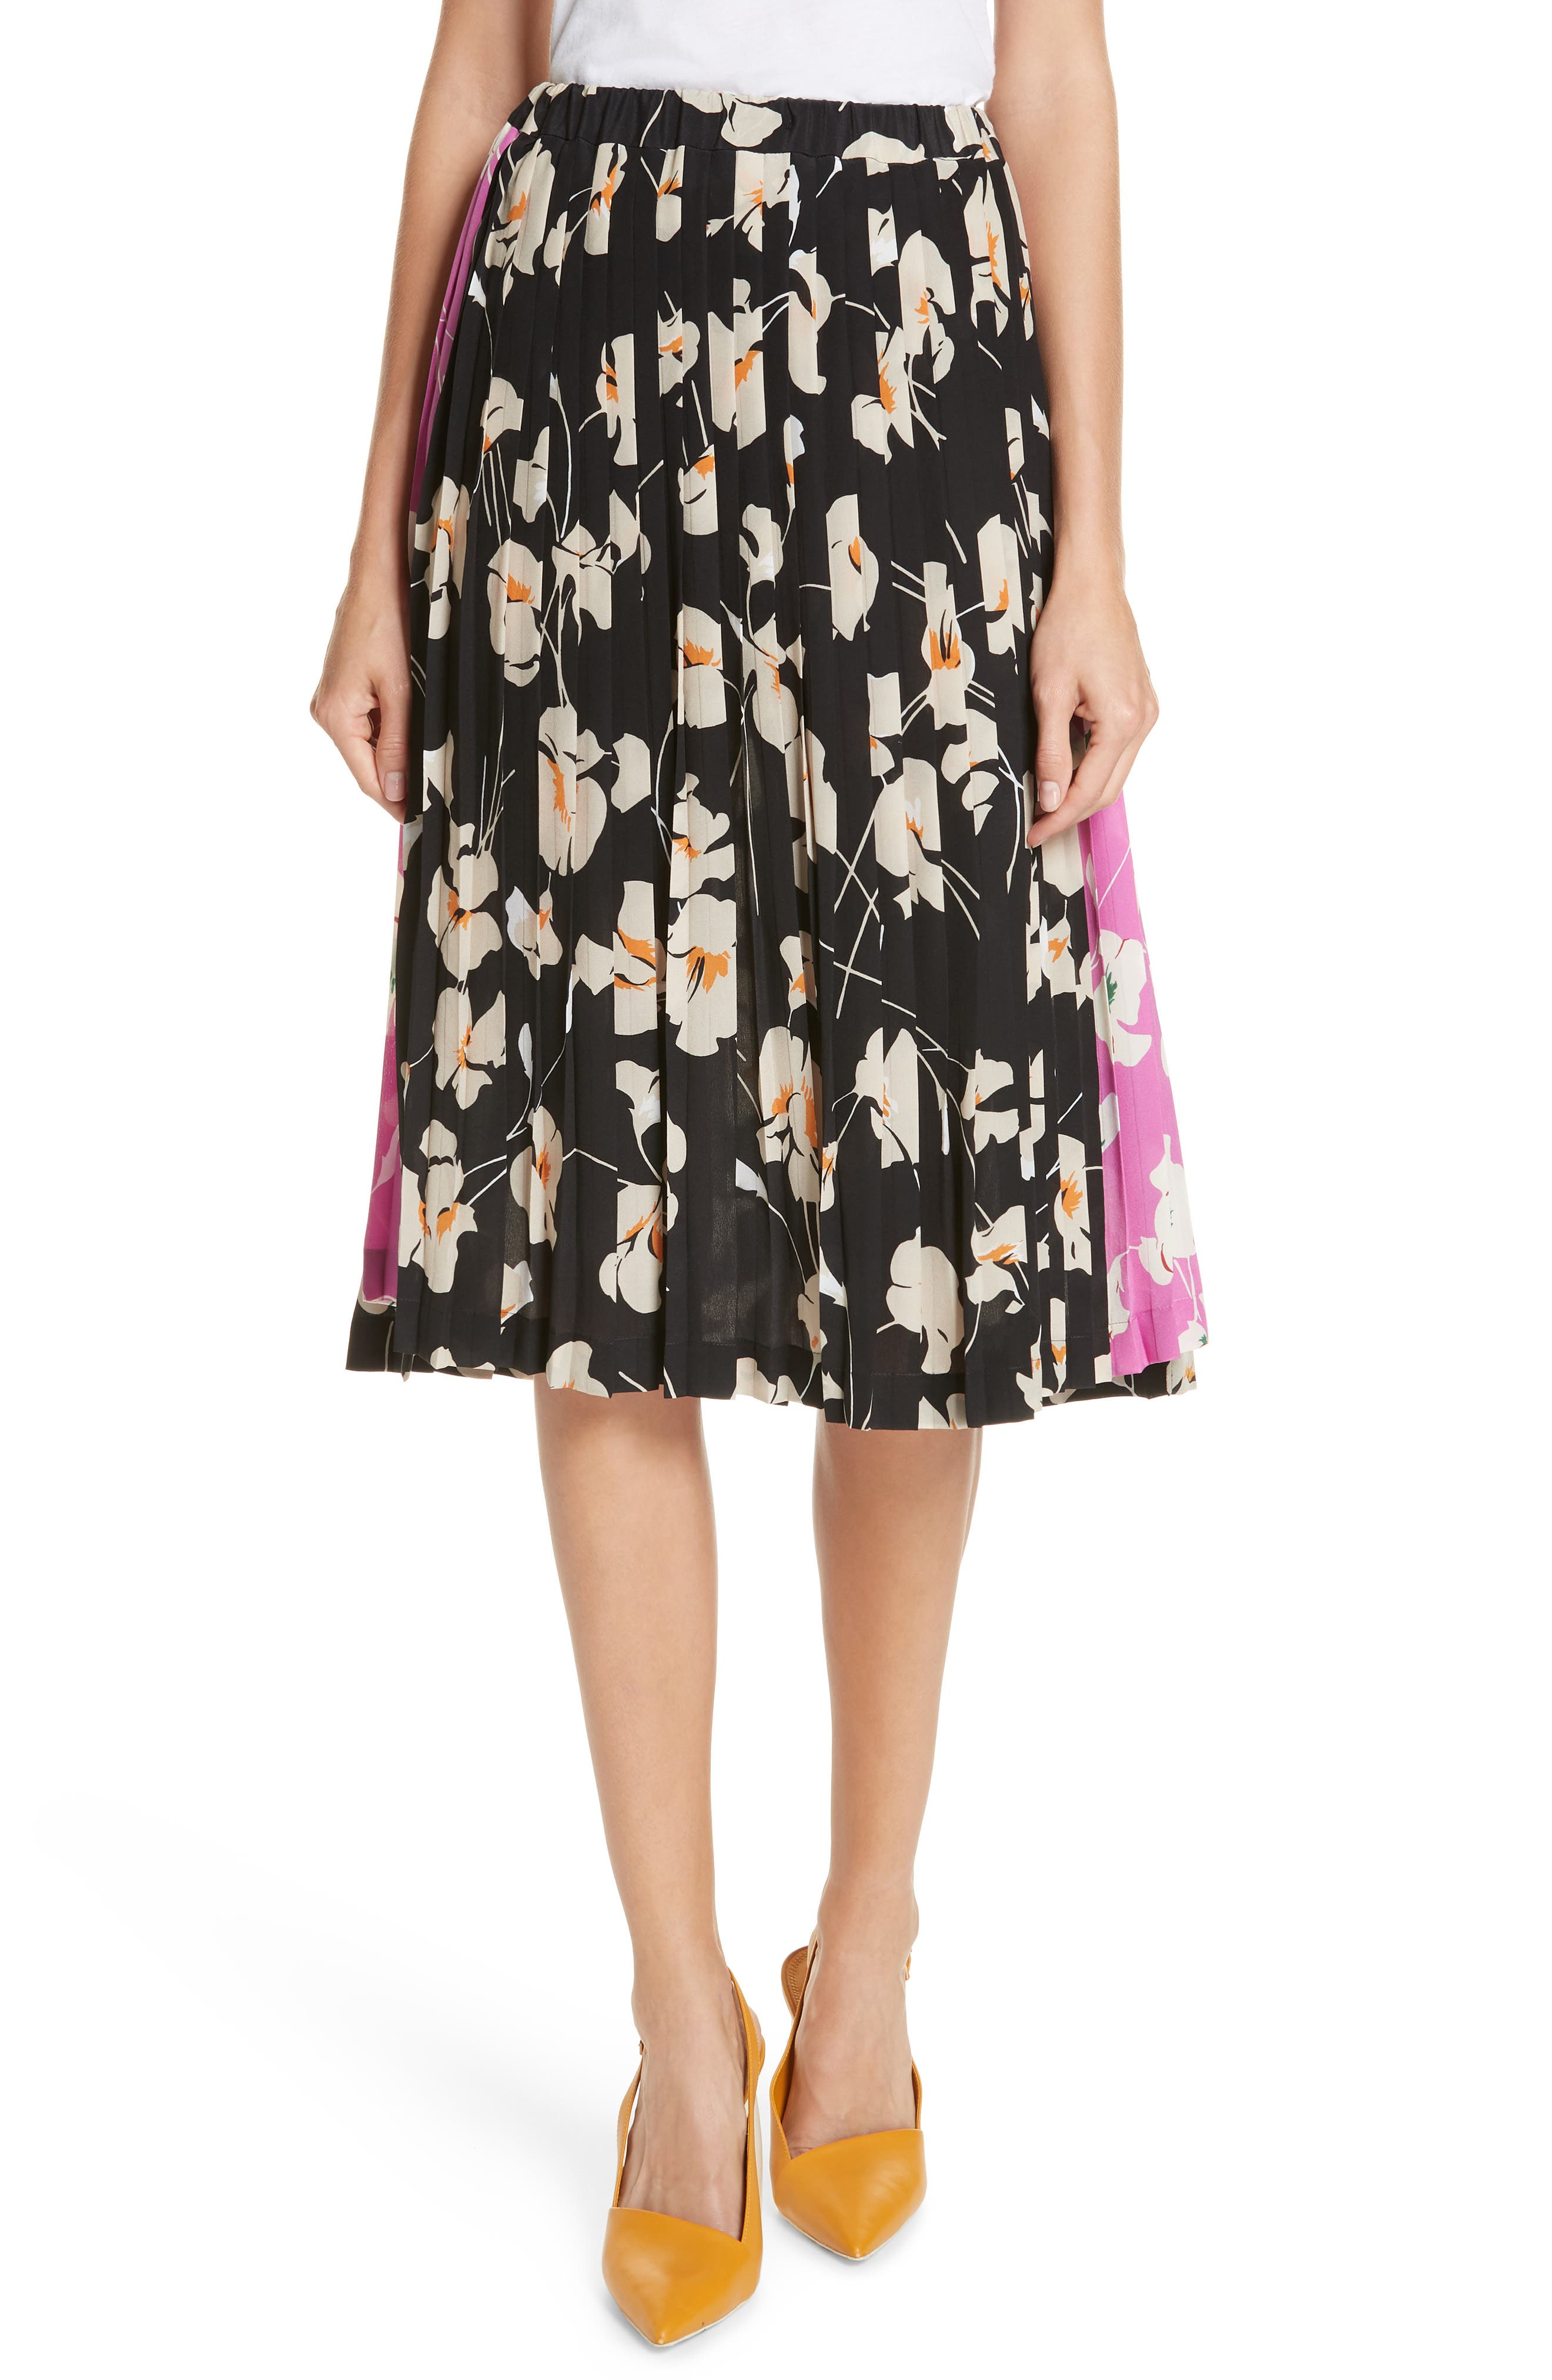 N°21 Nº21 Contrast Panel Floral Print Silk Skirt, Main, color, STAMPA FONDO NERO